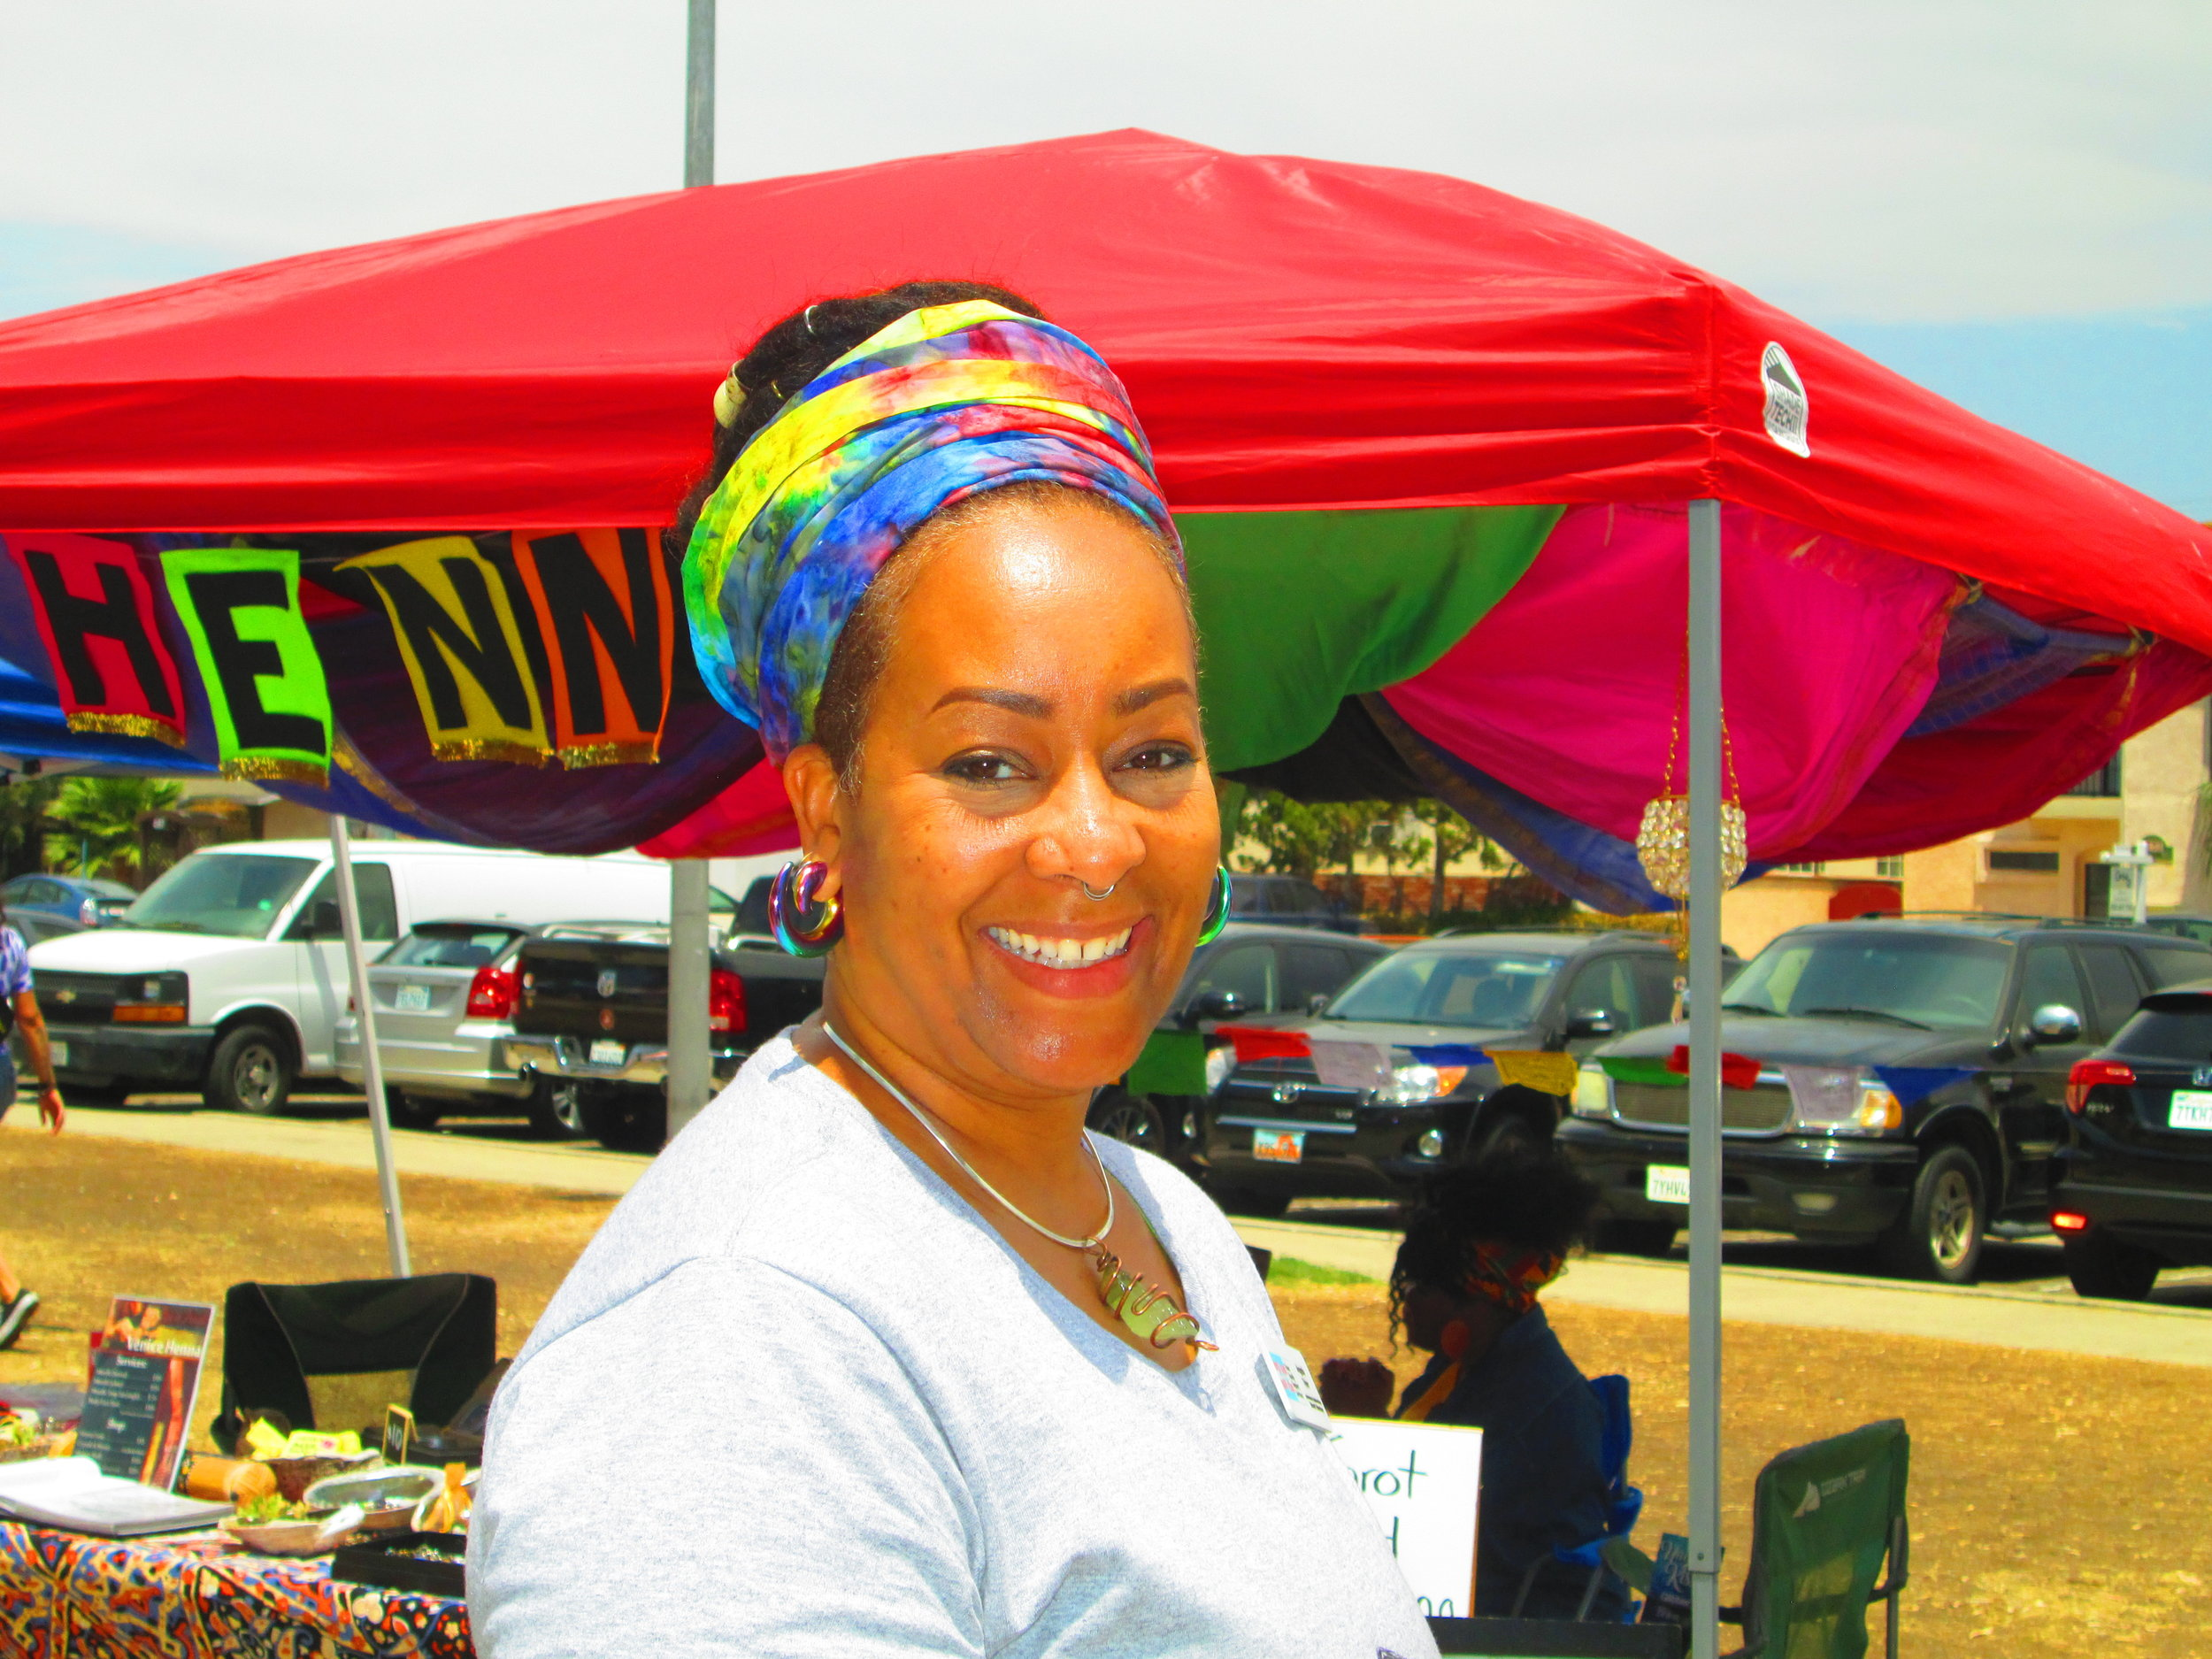 Angel Malaika Maua, Trans Activist & Community builder  angela@transfamilysos.org   www.transfamilysos.org